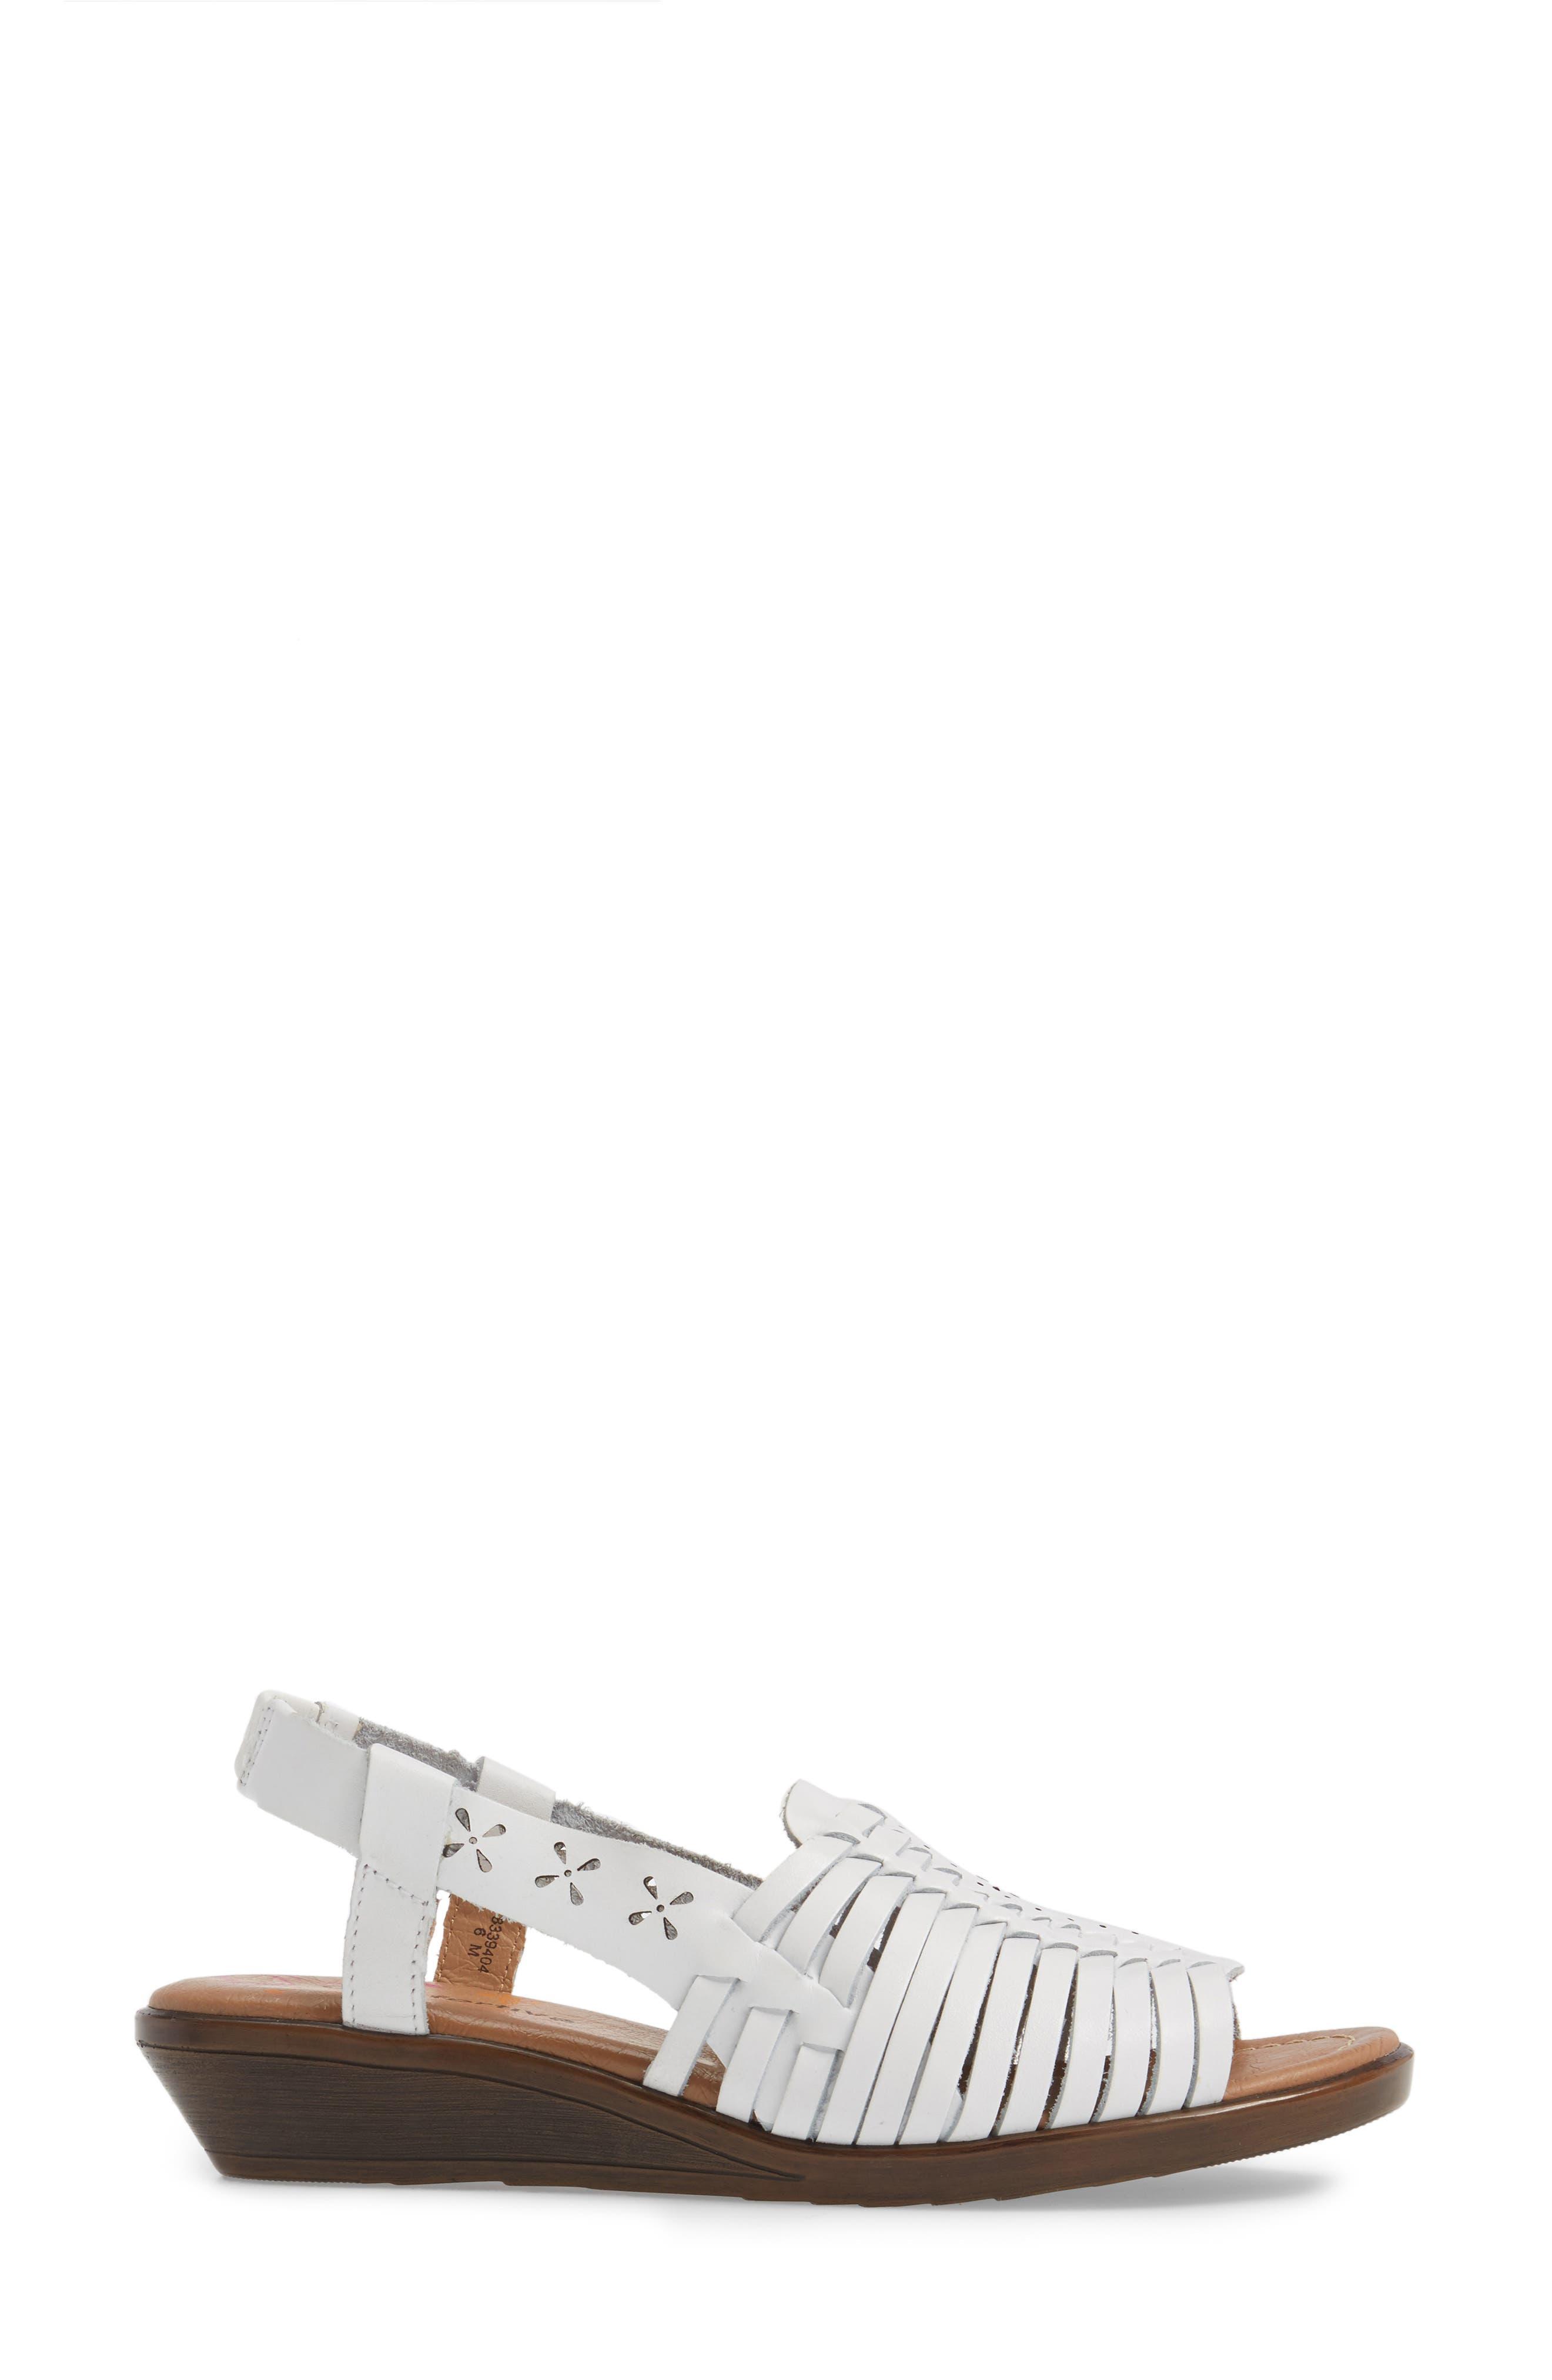 Formasa Huarache Slingback Sandal,                             Alternate thumbnail 3, color,                             100